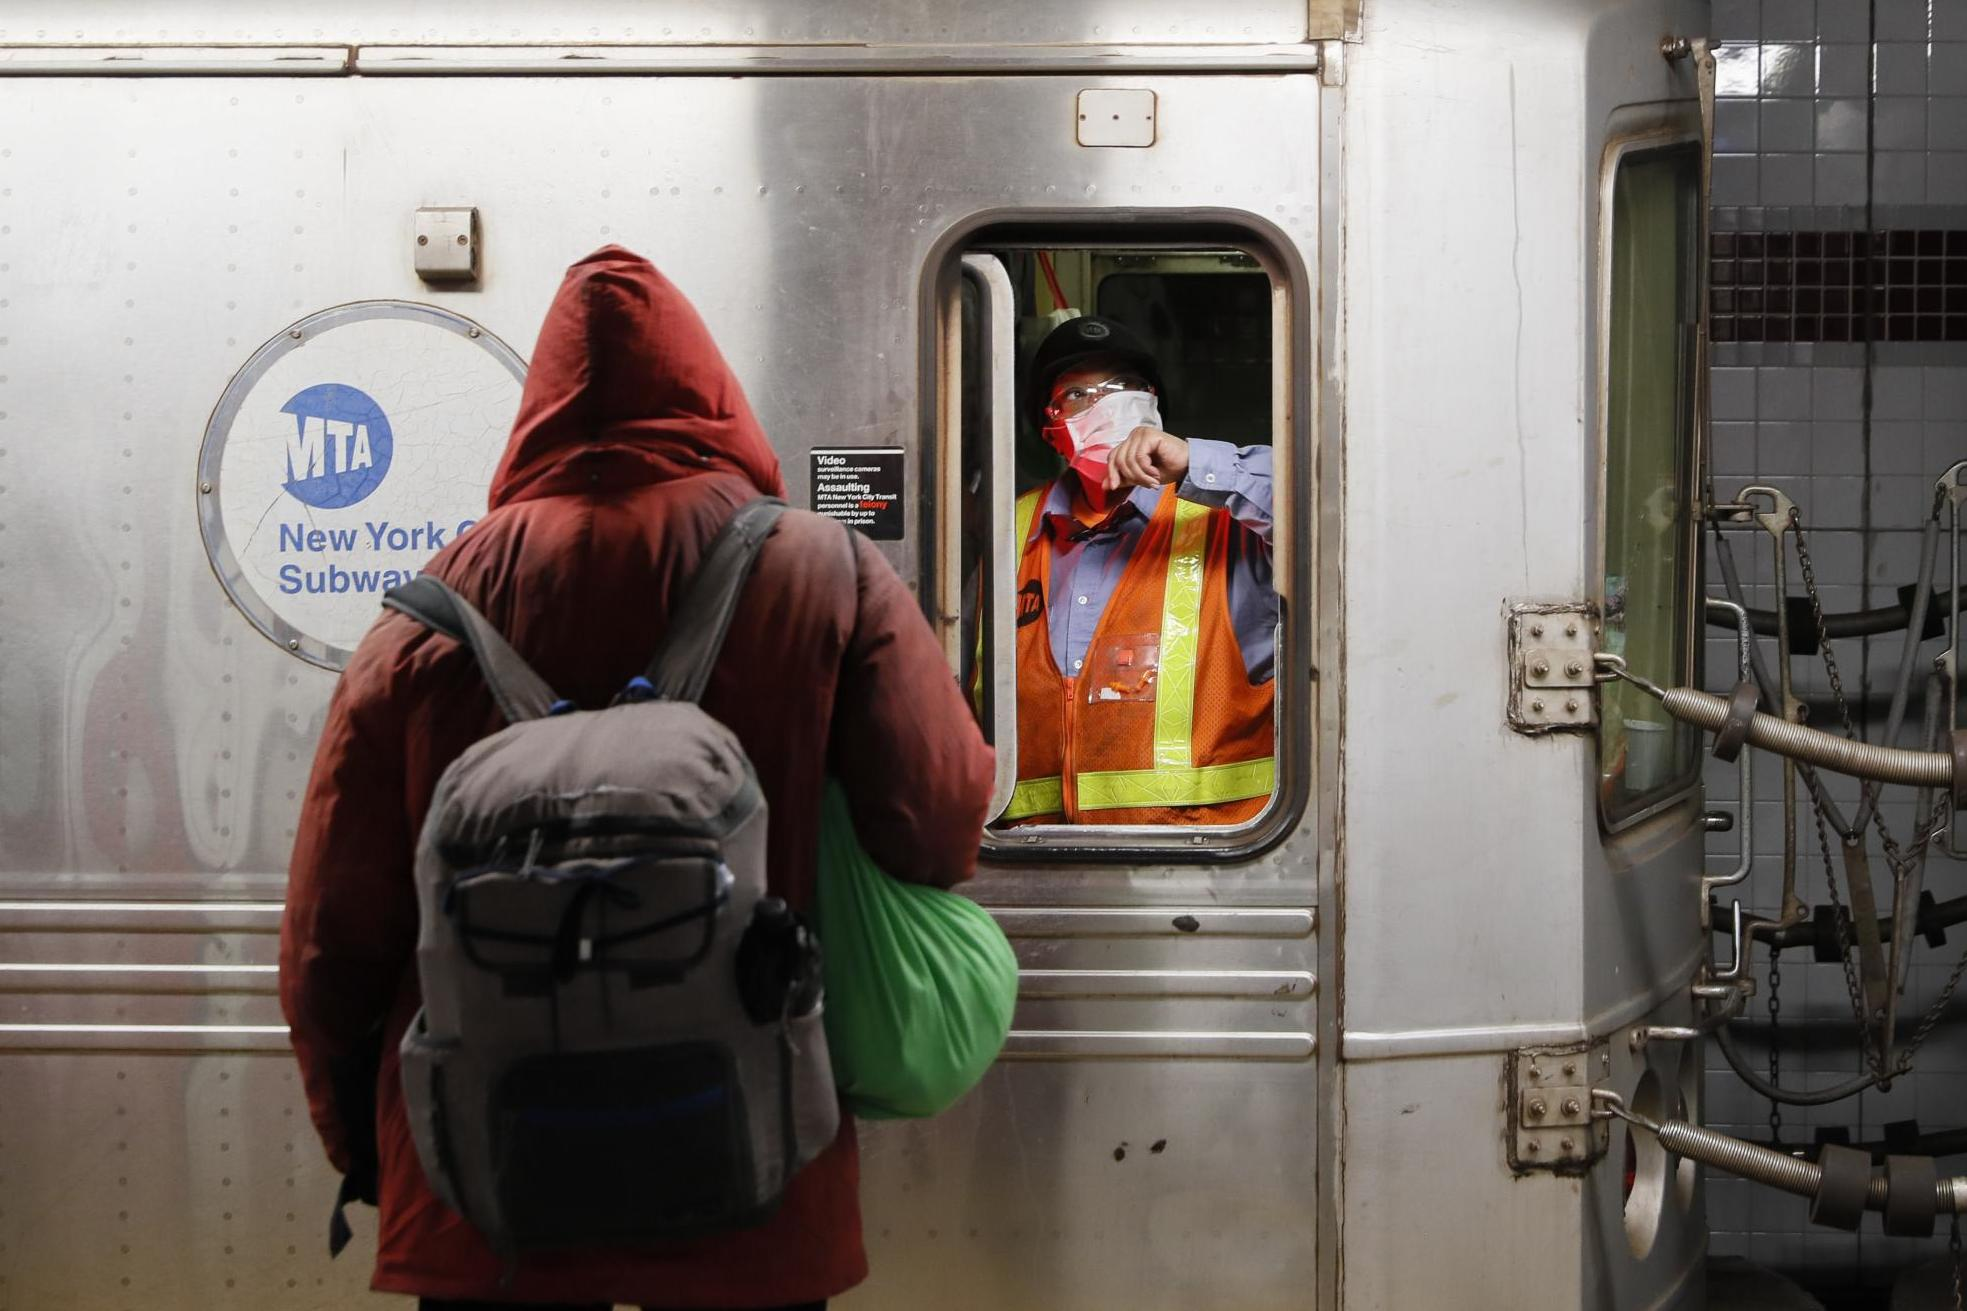 Coronavirus: New York City ends 24-hour subway service to clean trains every night photo